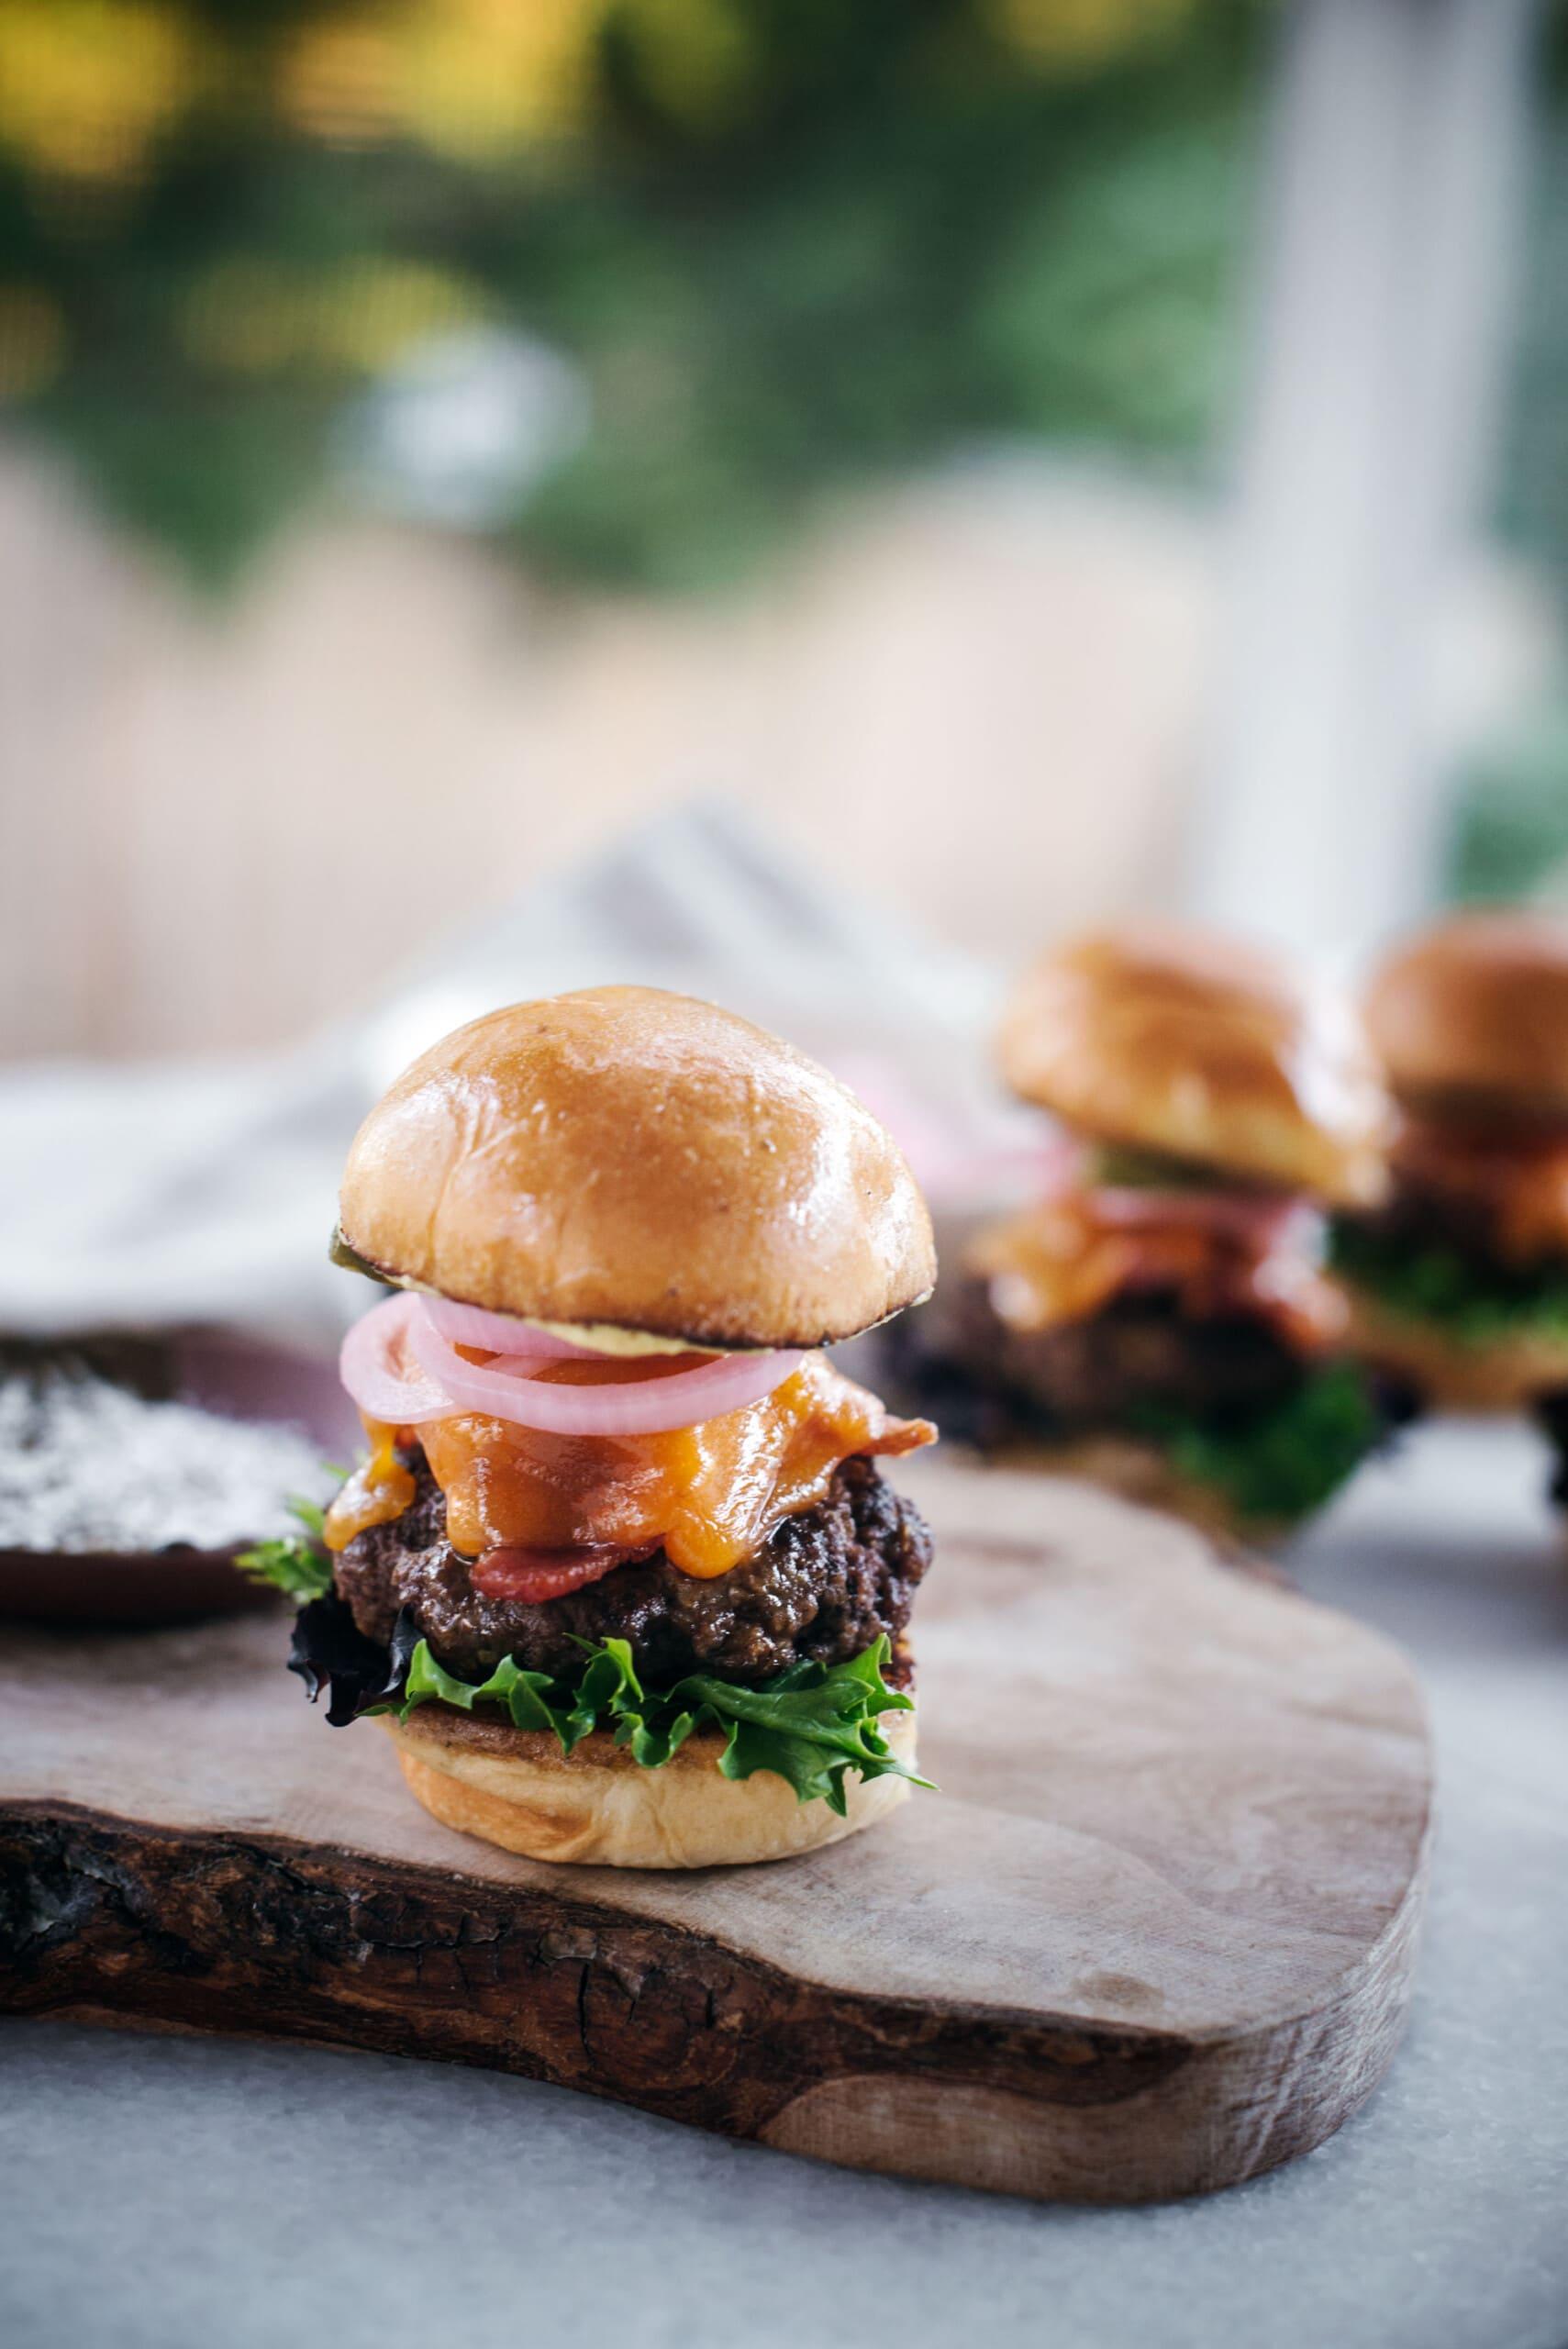 Easy to Make Tailgate Food Ideas: Mustard Burger Sliders